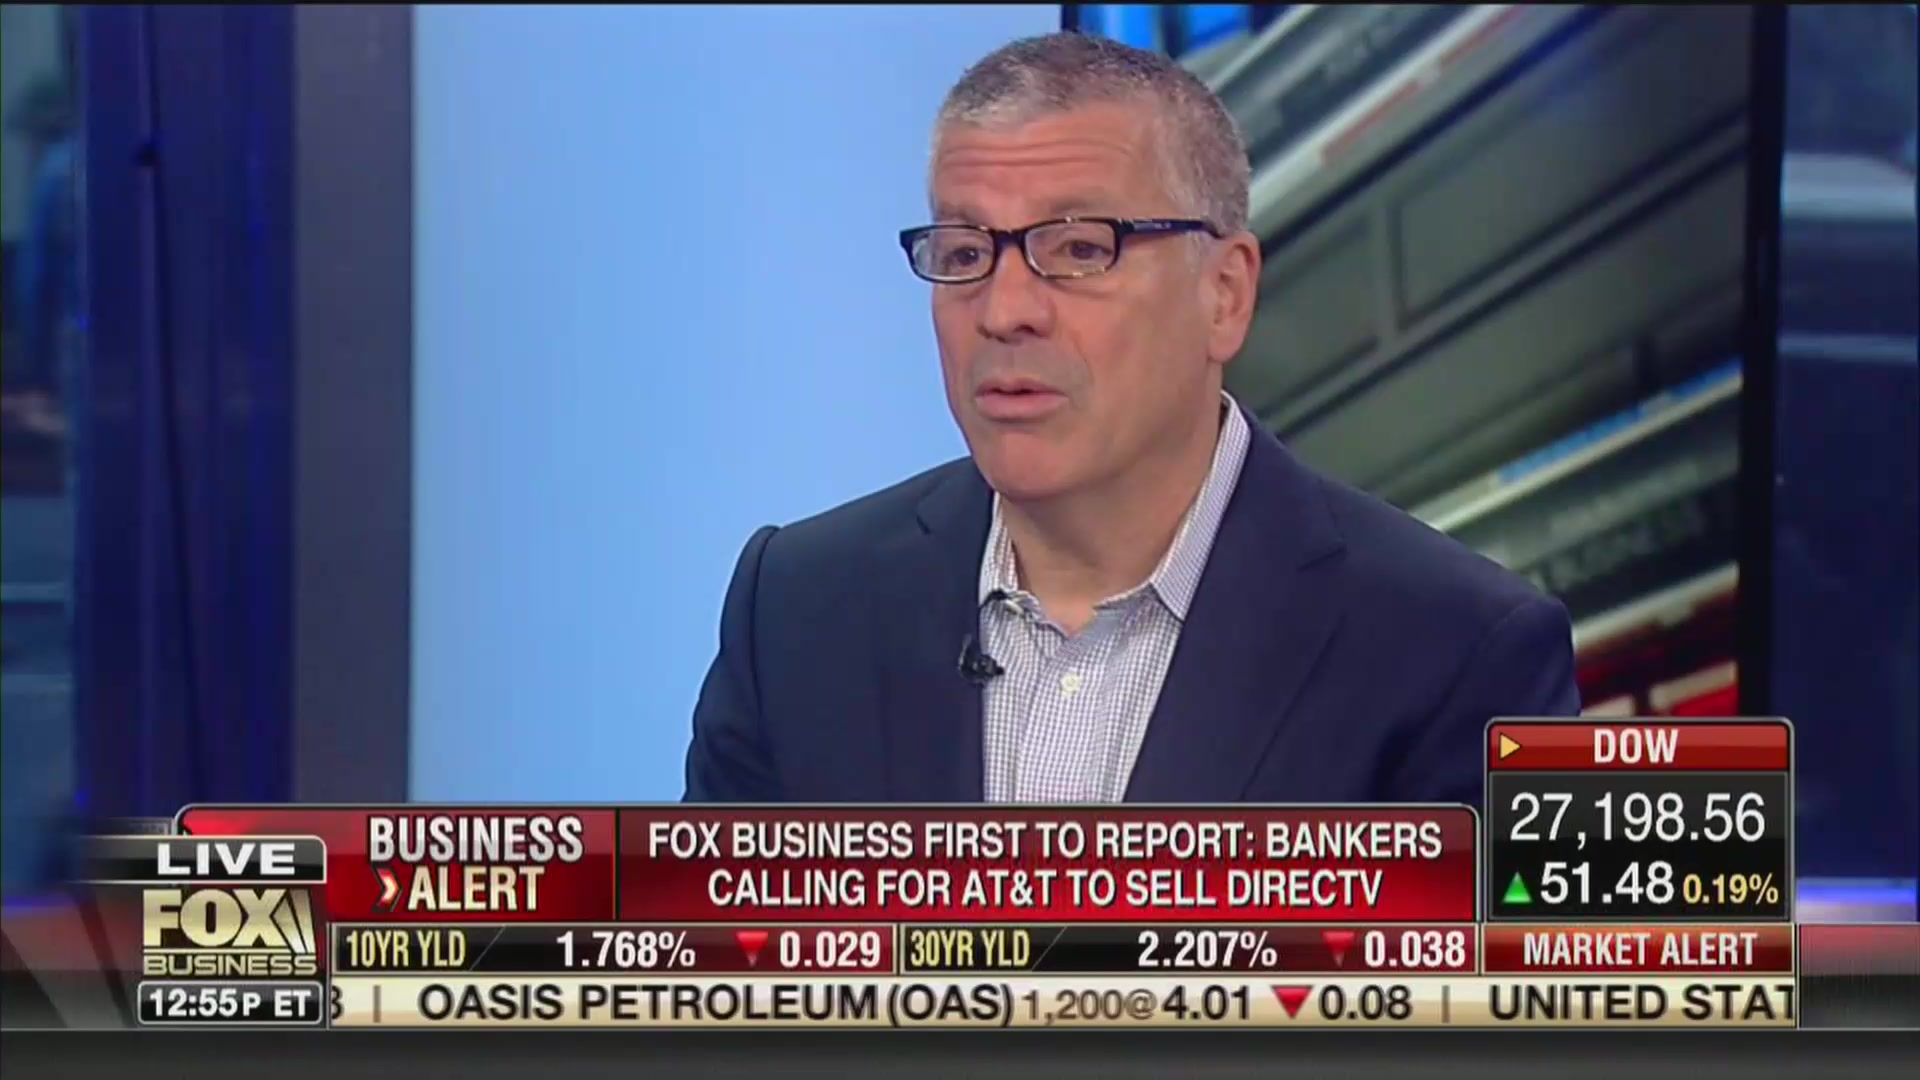 Fox's Charlie Gasparino Blasts WSJ Colleagues: They 'Couldn't Wear My Jockstrap!'